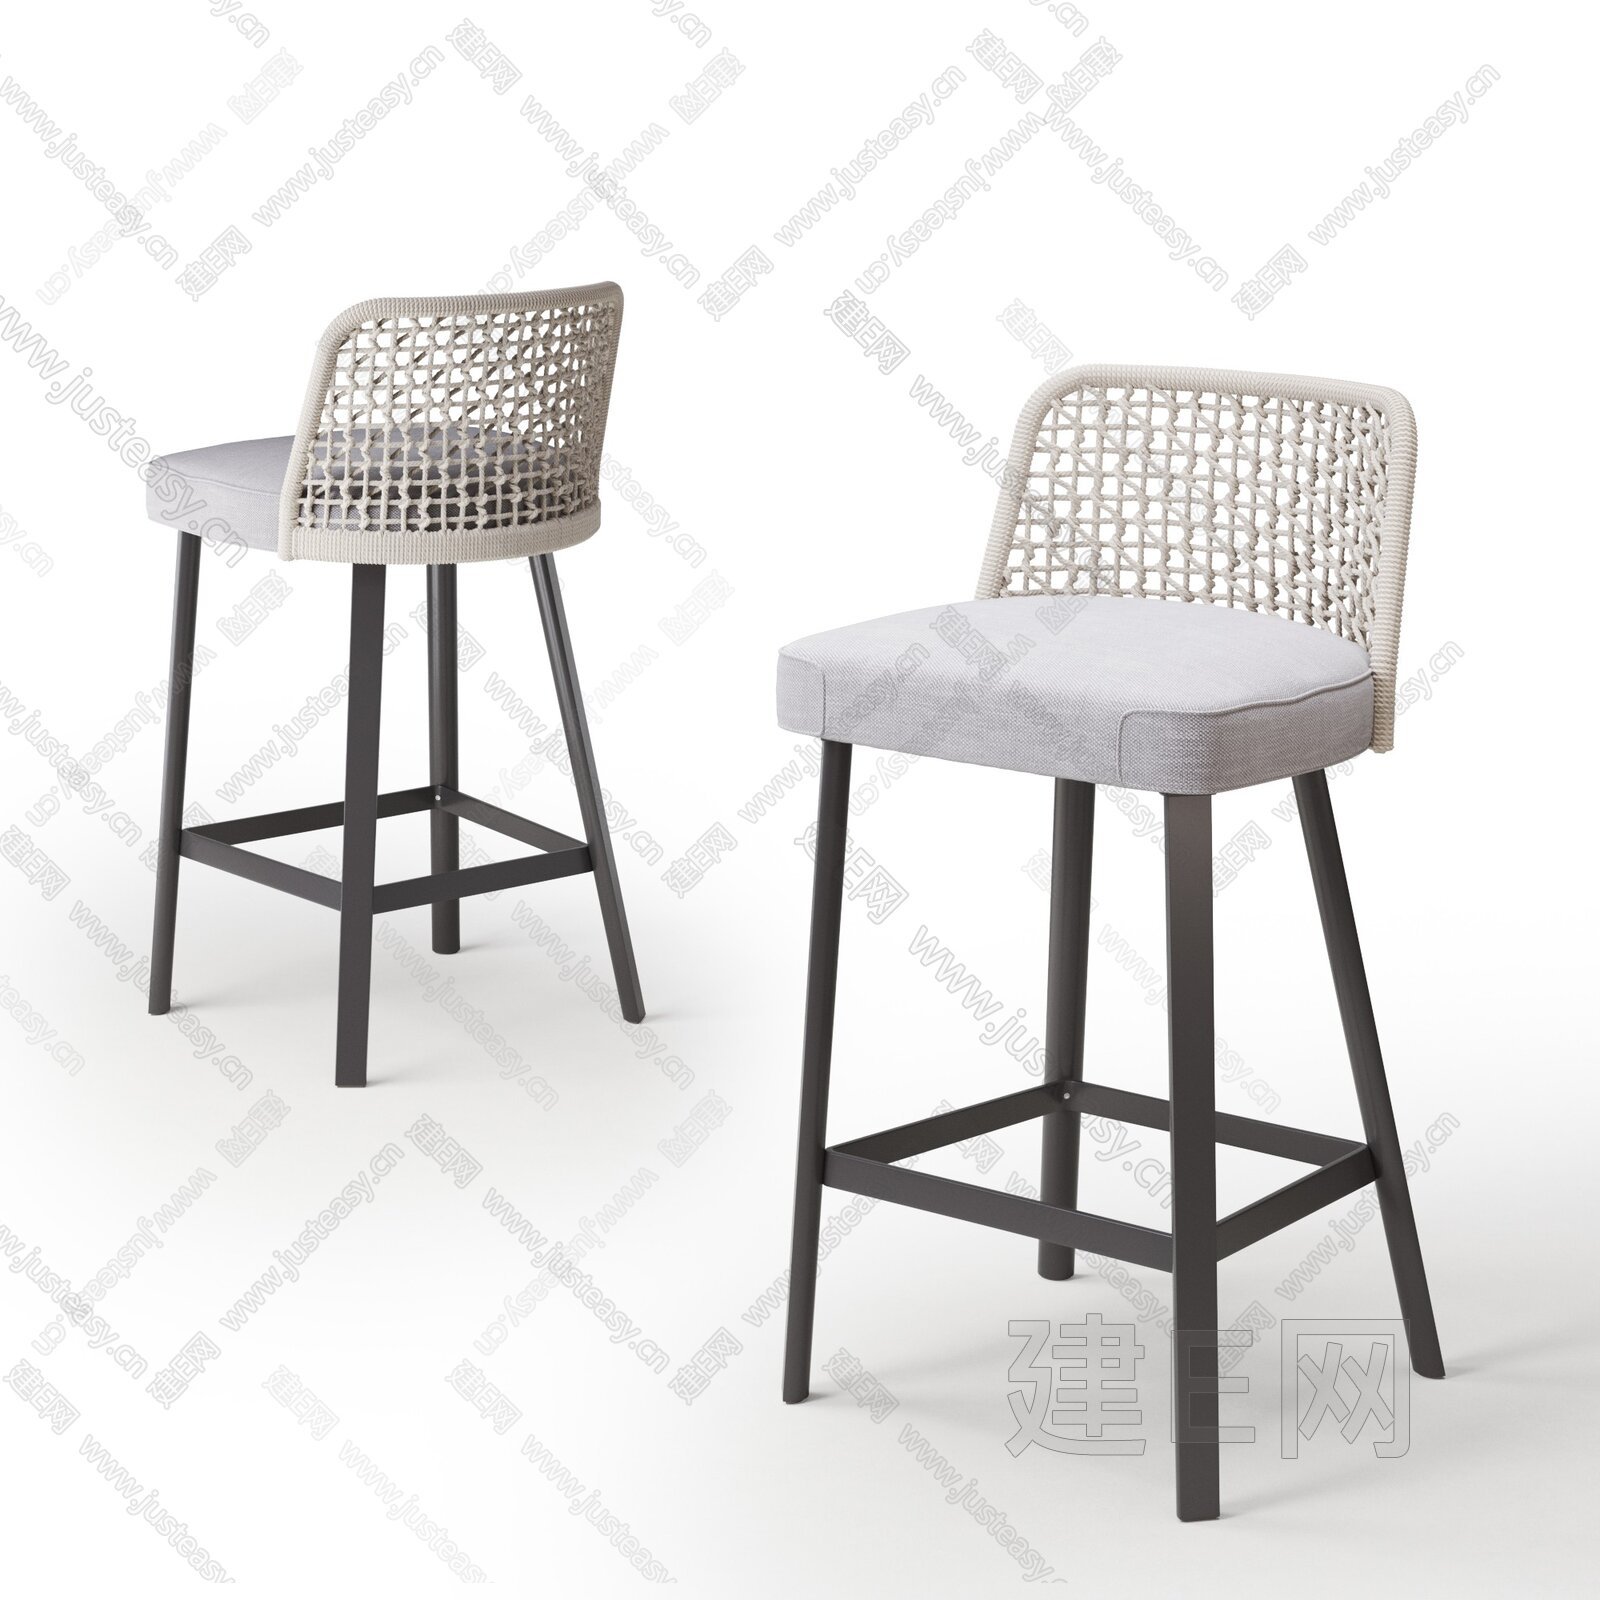 B&B 现代吧椅组合3d模型